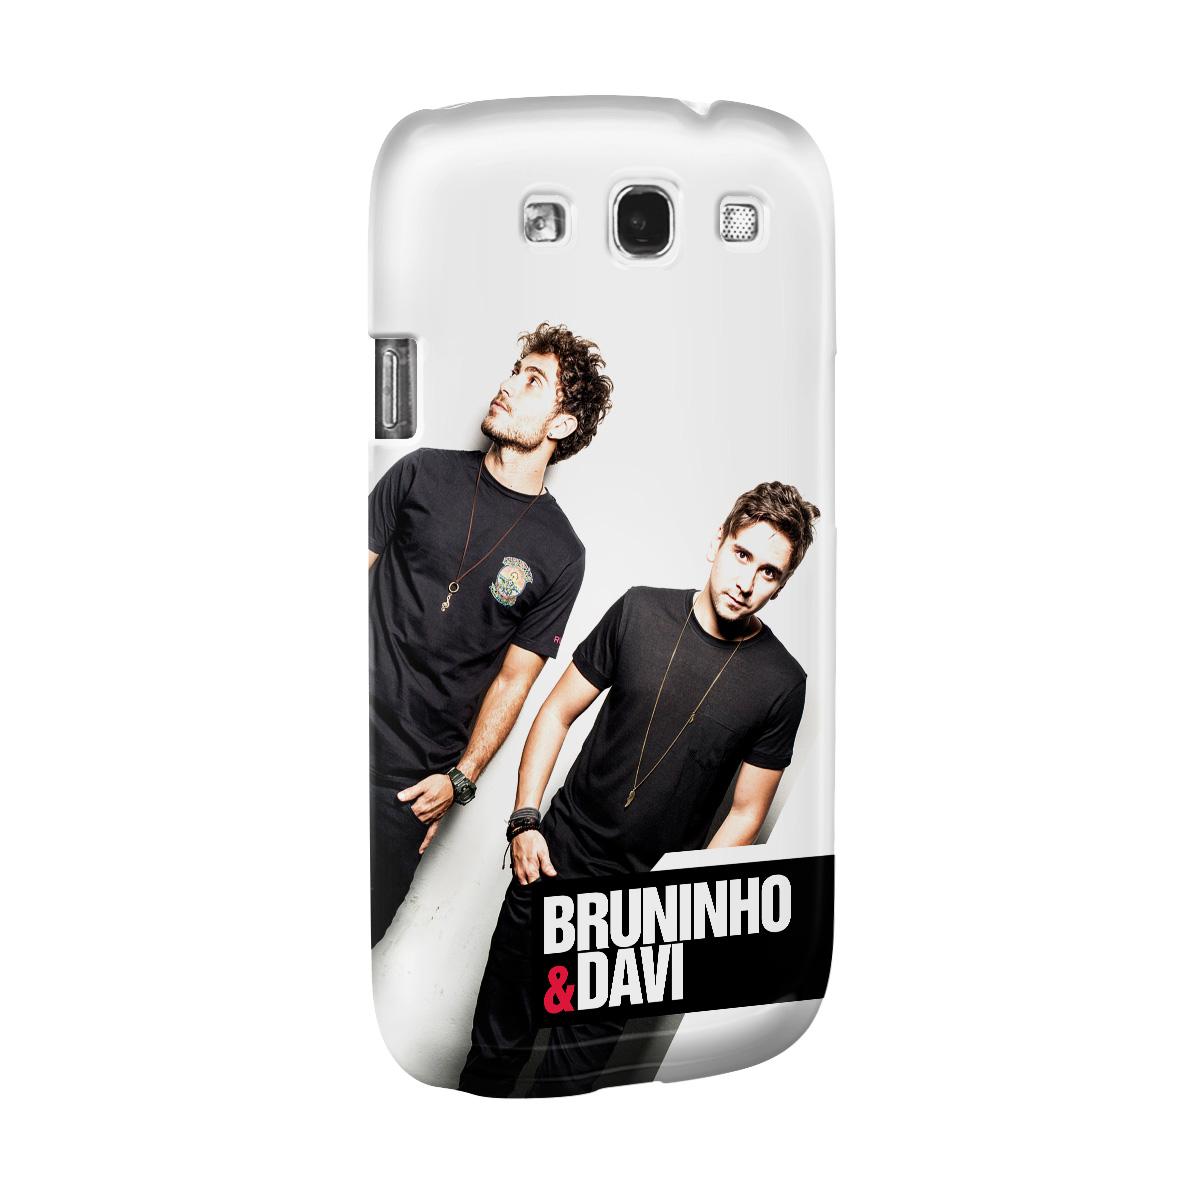 Capa para Samsung Galaxy S3 Bruninho & Davi Foto